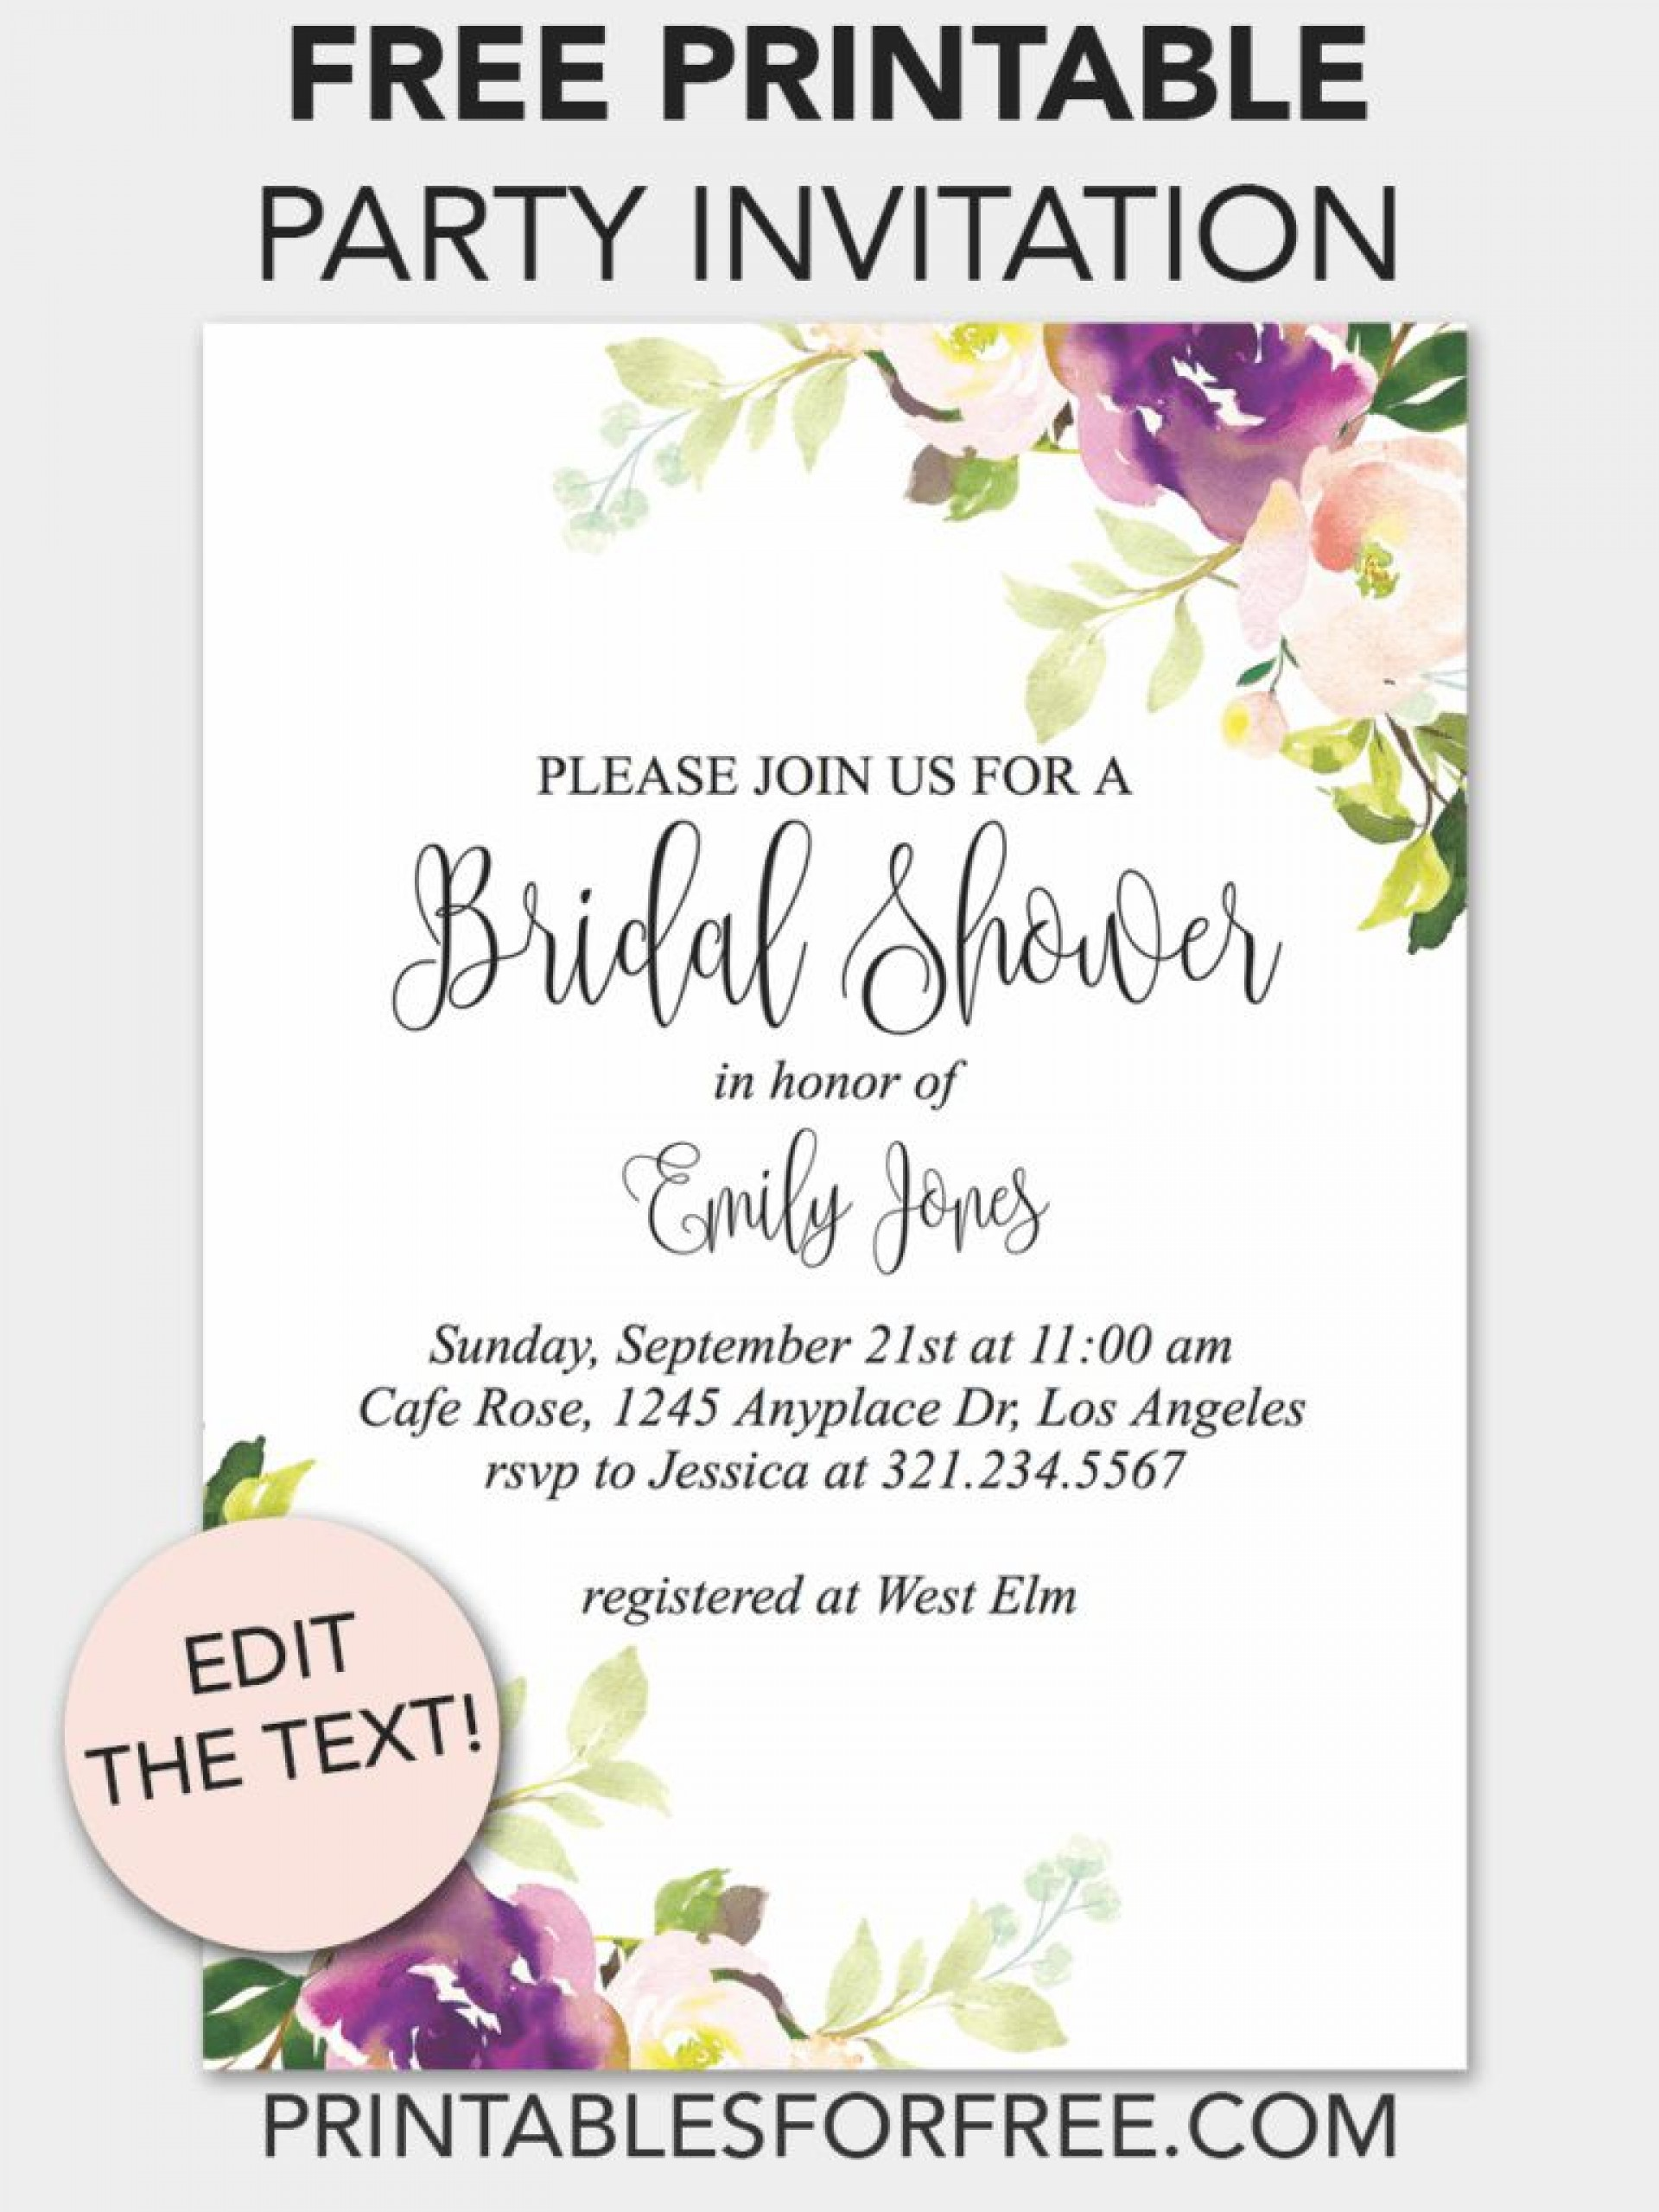 003 Rare Free Bridal Shower Invite Template Inspiration  Invitation For Word Wedding Microsoft1920